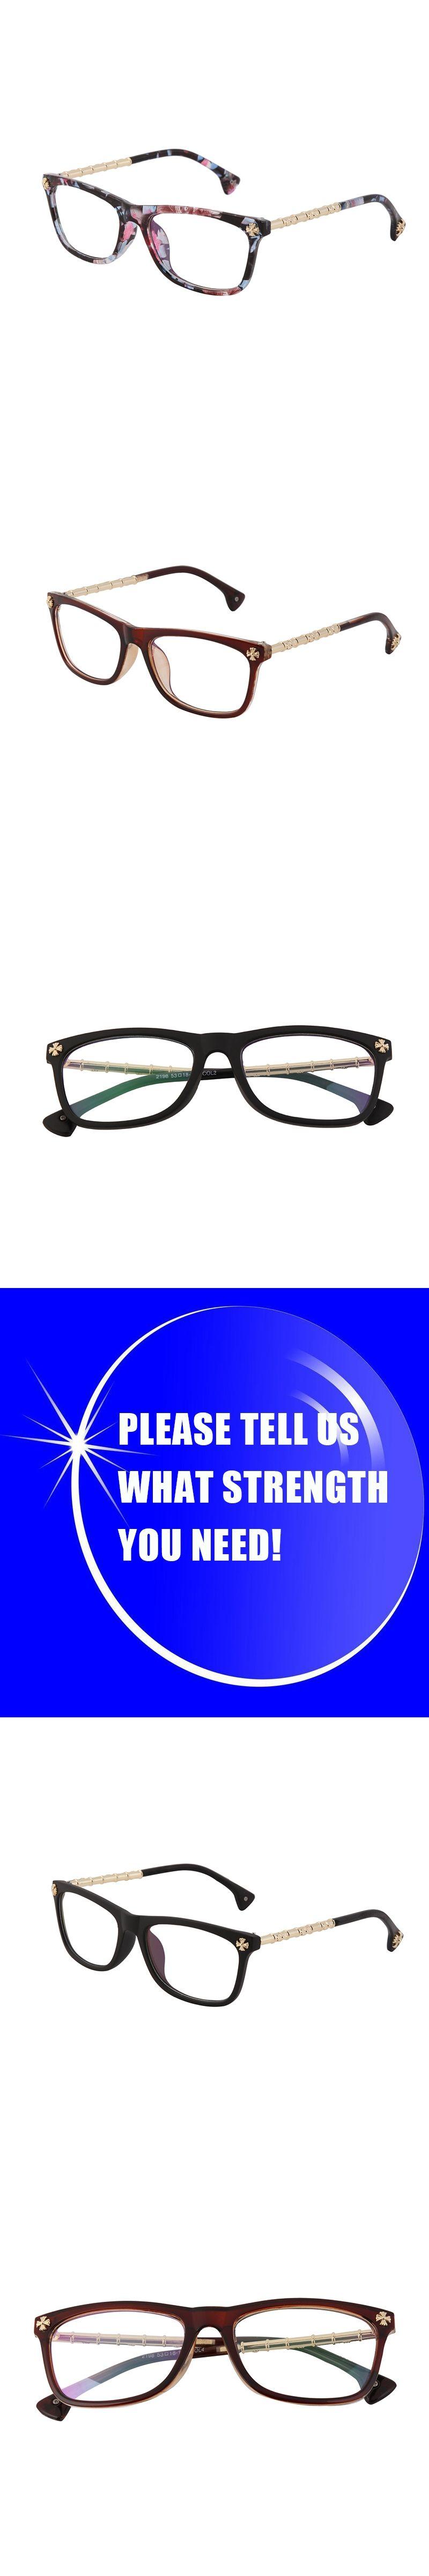 de2c53023c00 Computer Radiation Myopia Nearsighted Glasses Mens Womens Fashion Eyewear  -0.50 to -6.0 Lens Shortsighted Anti Blue Ray Lenses